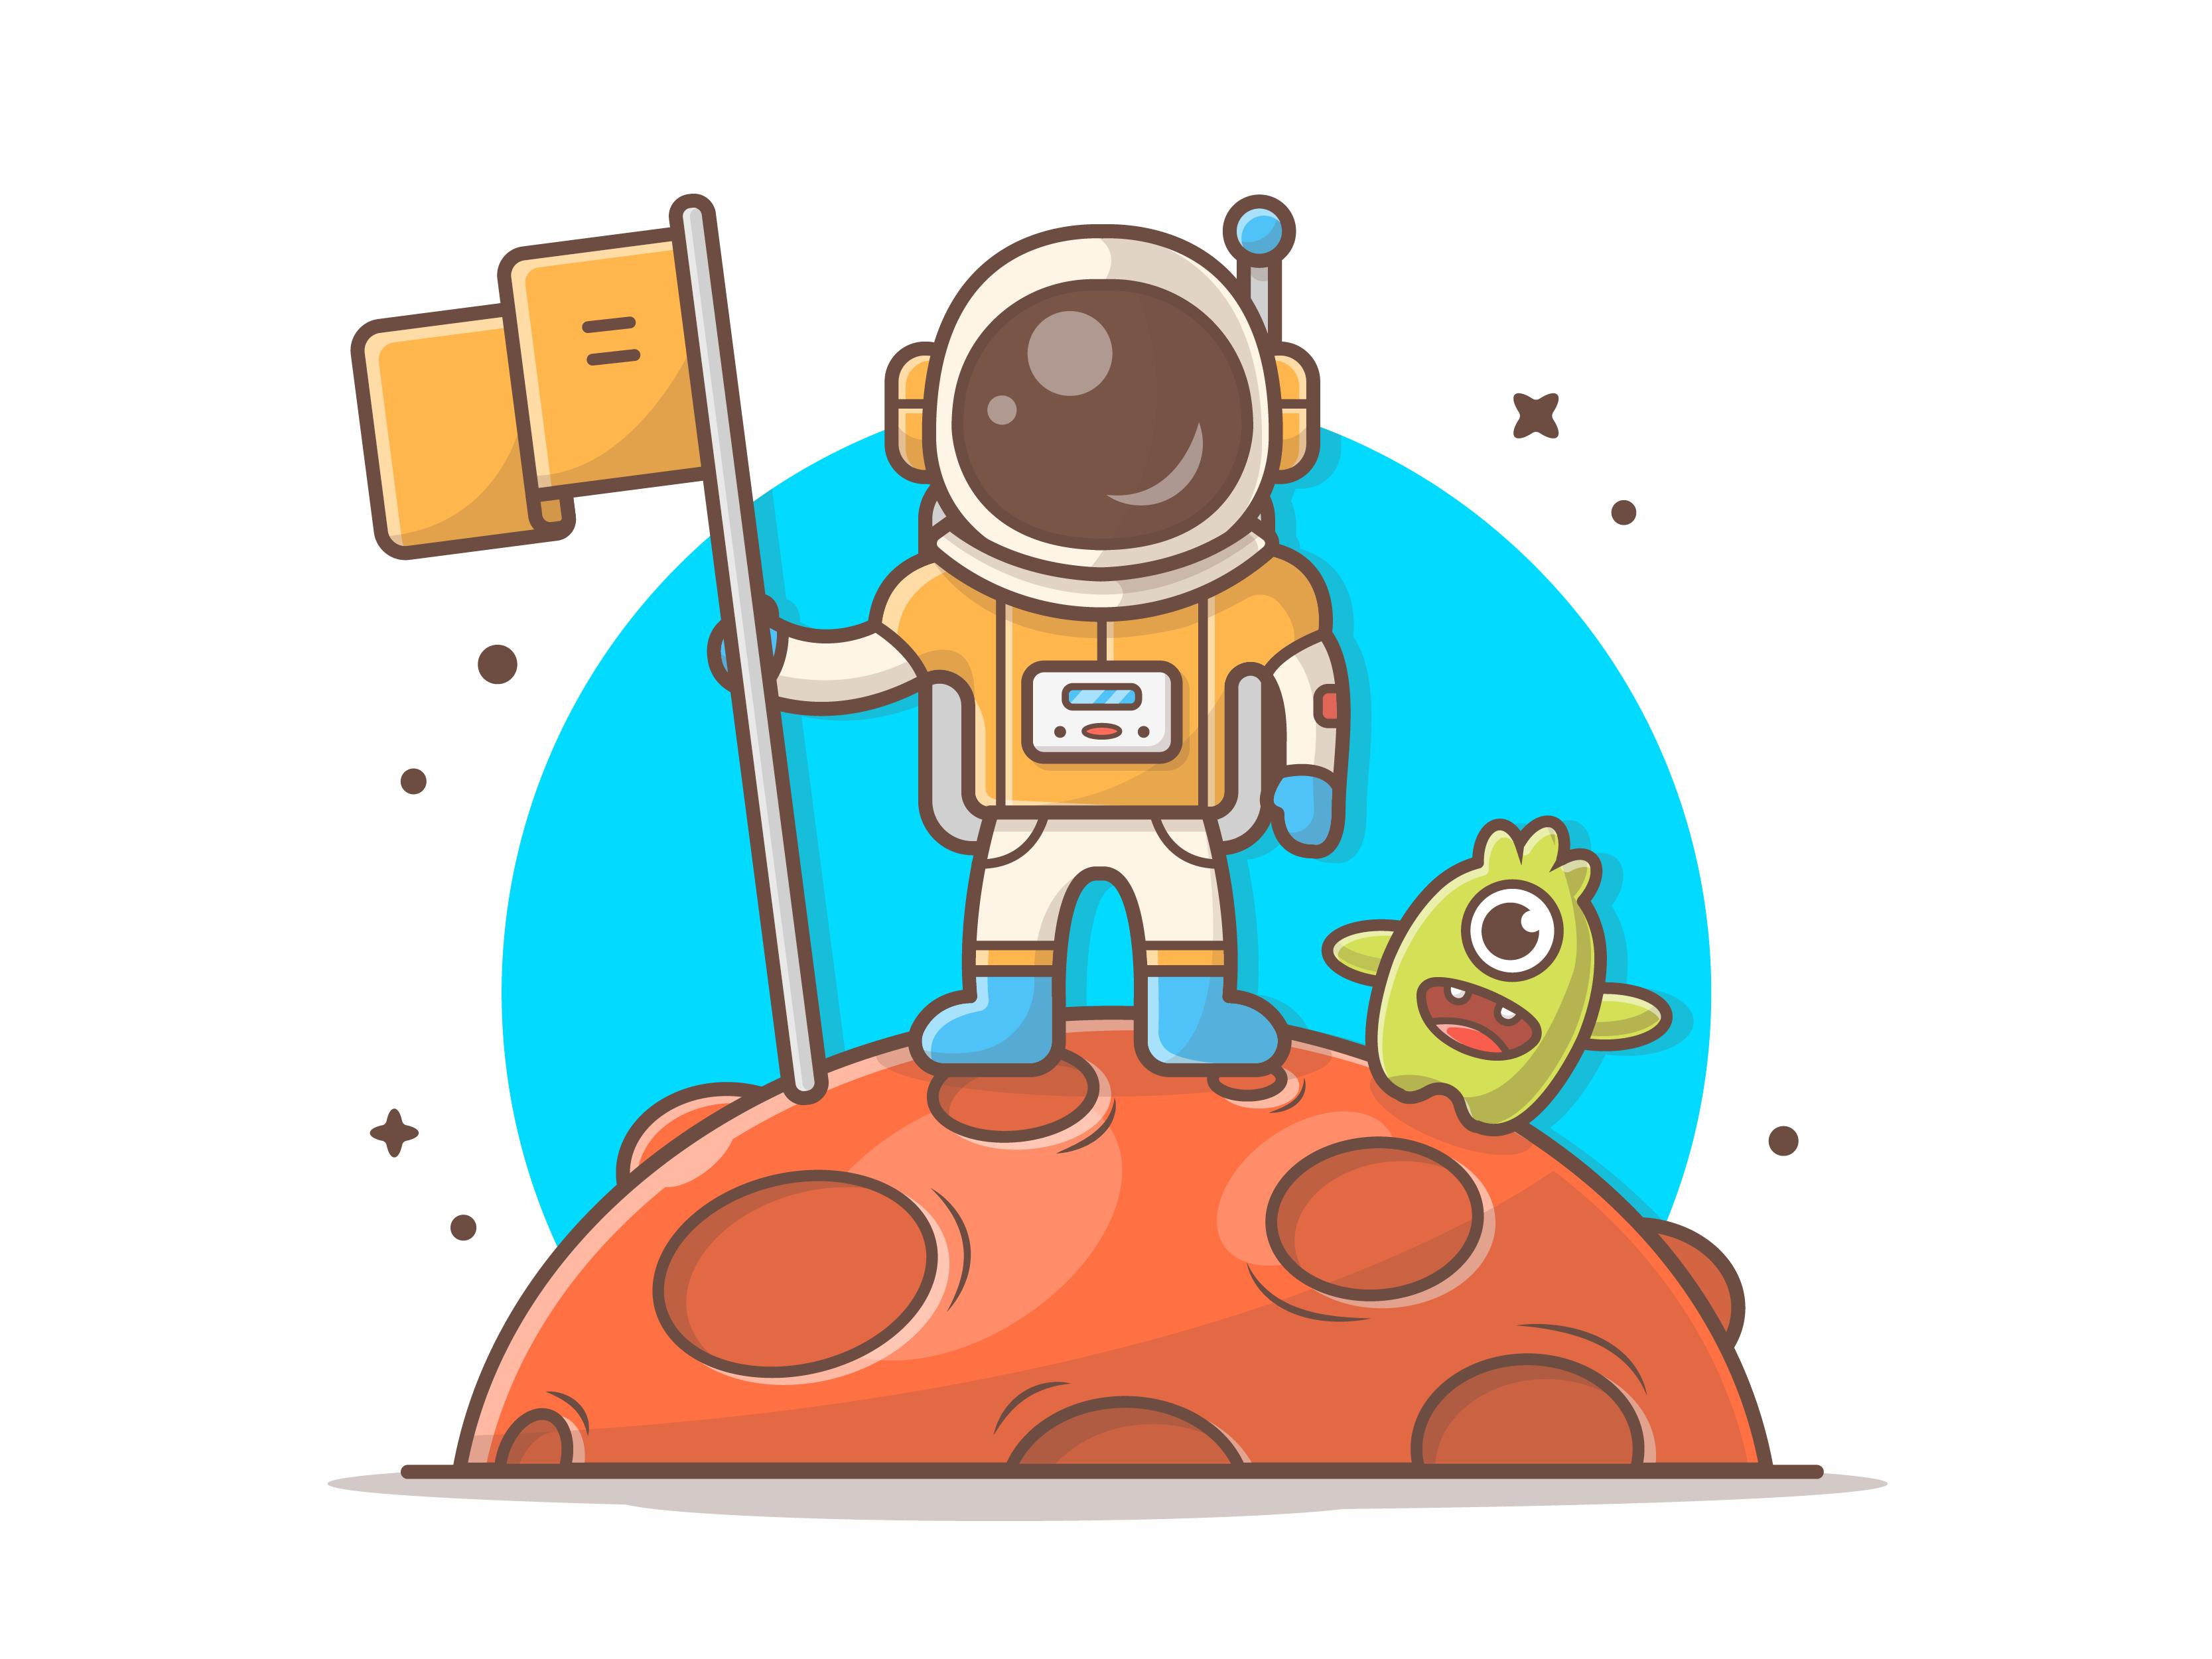 Astro standing on moon dribbble 07